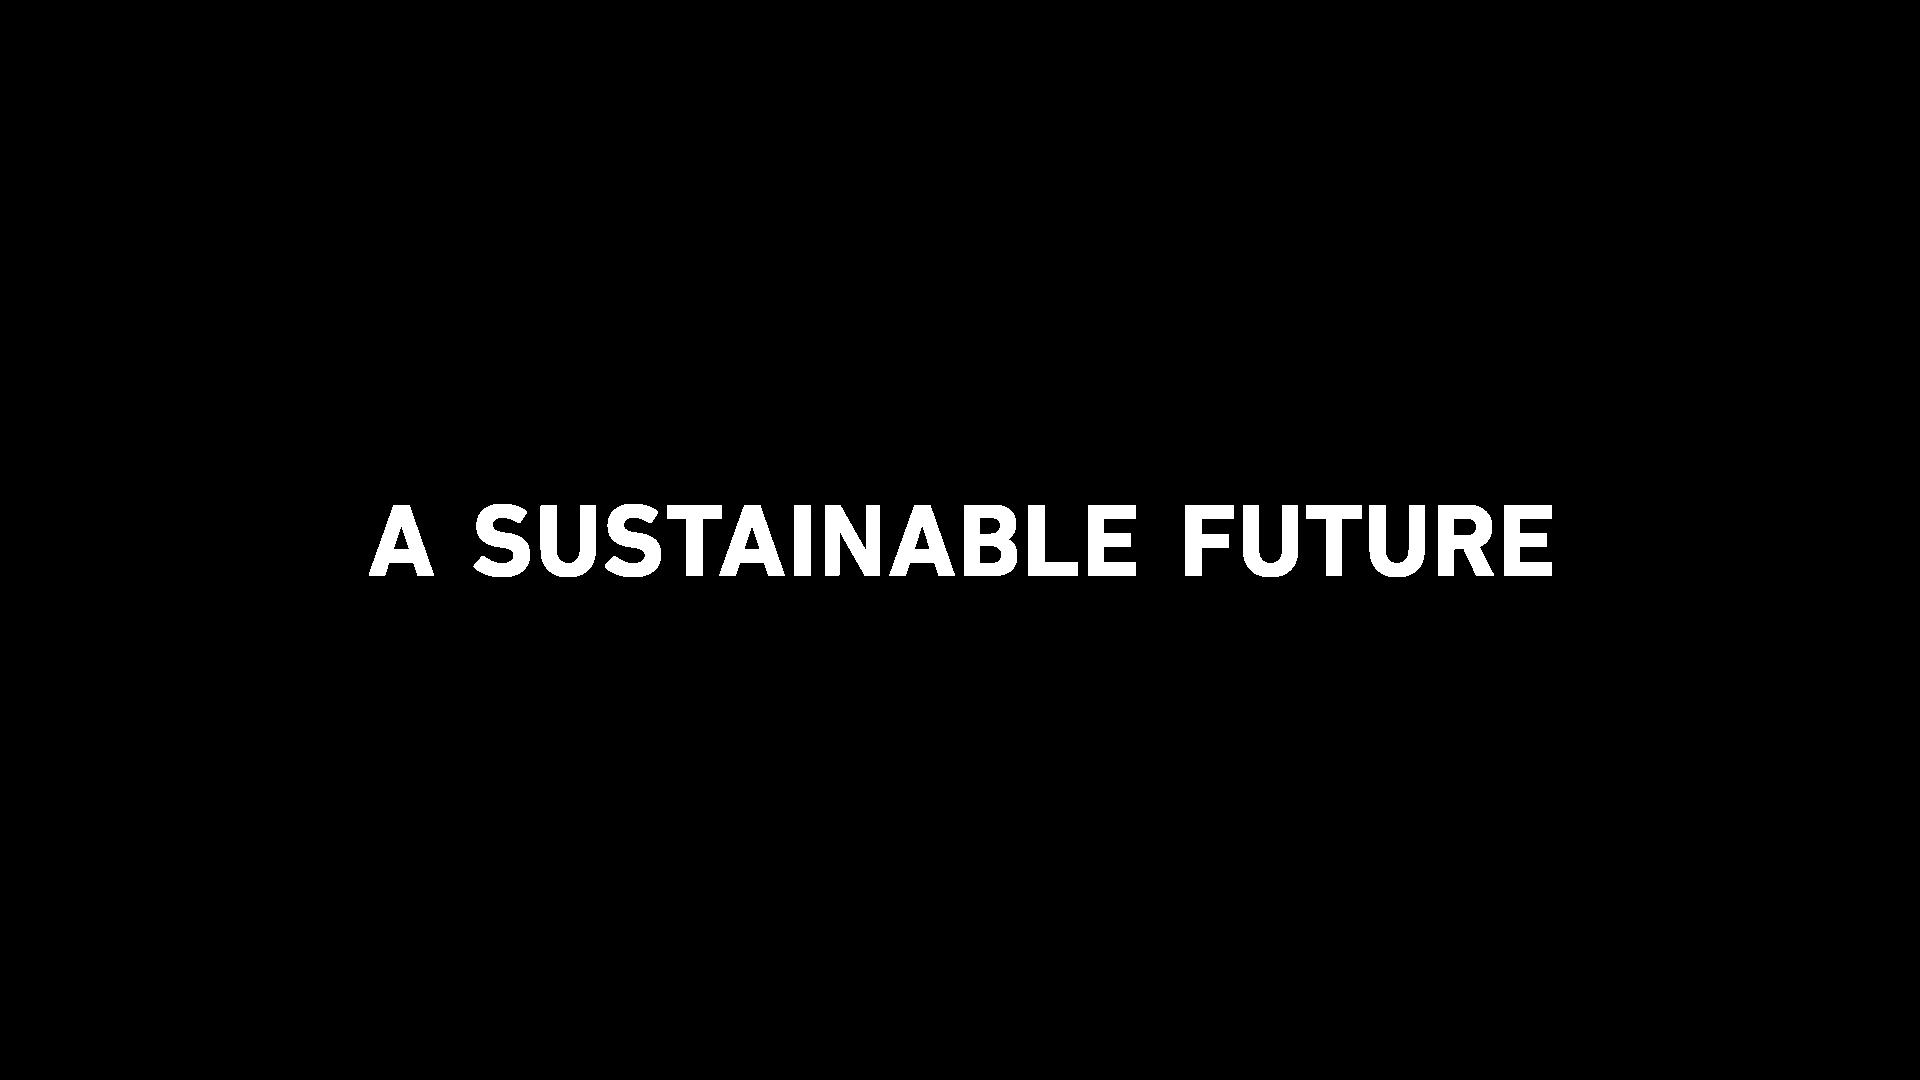 A SUSTANBLE FUTURE